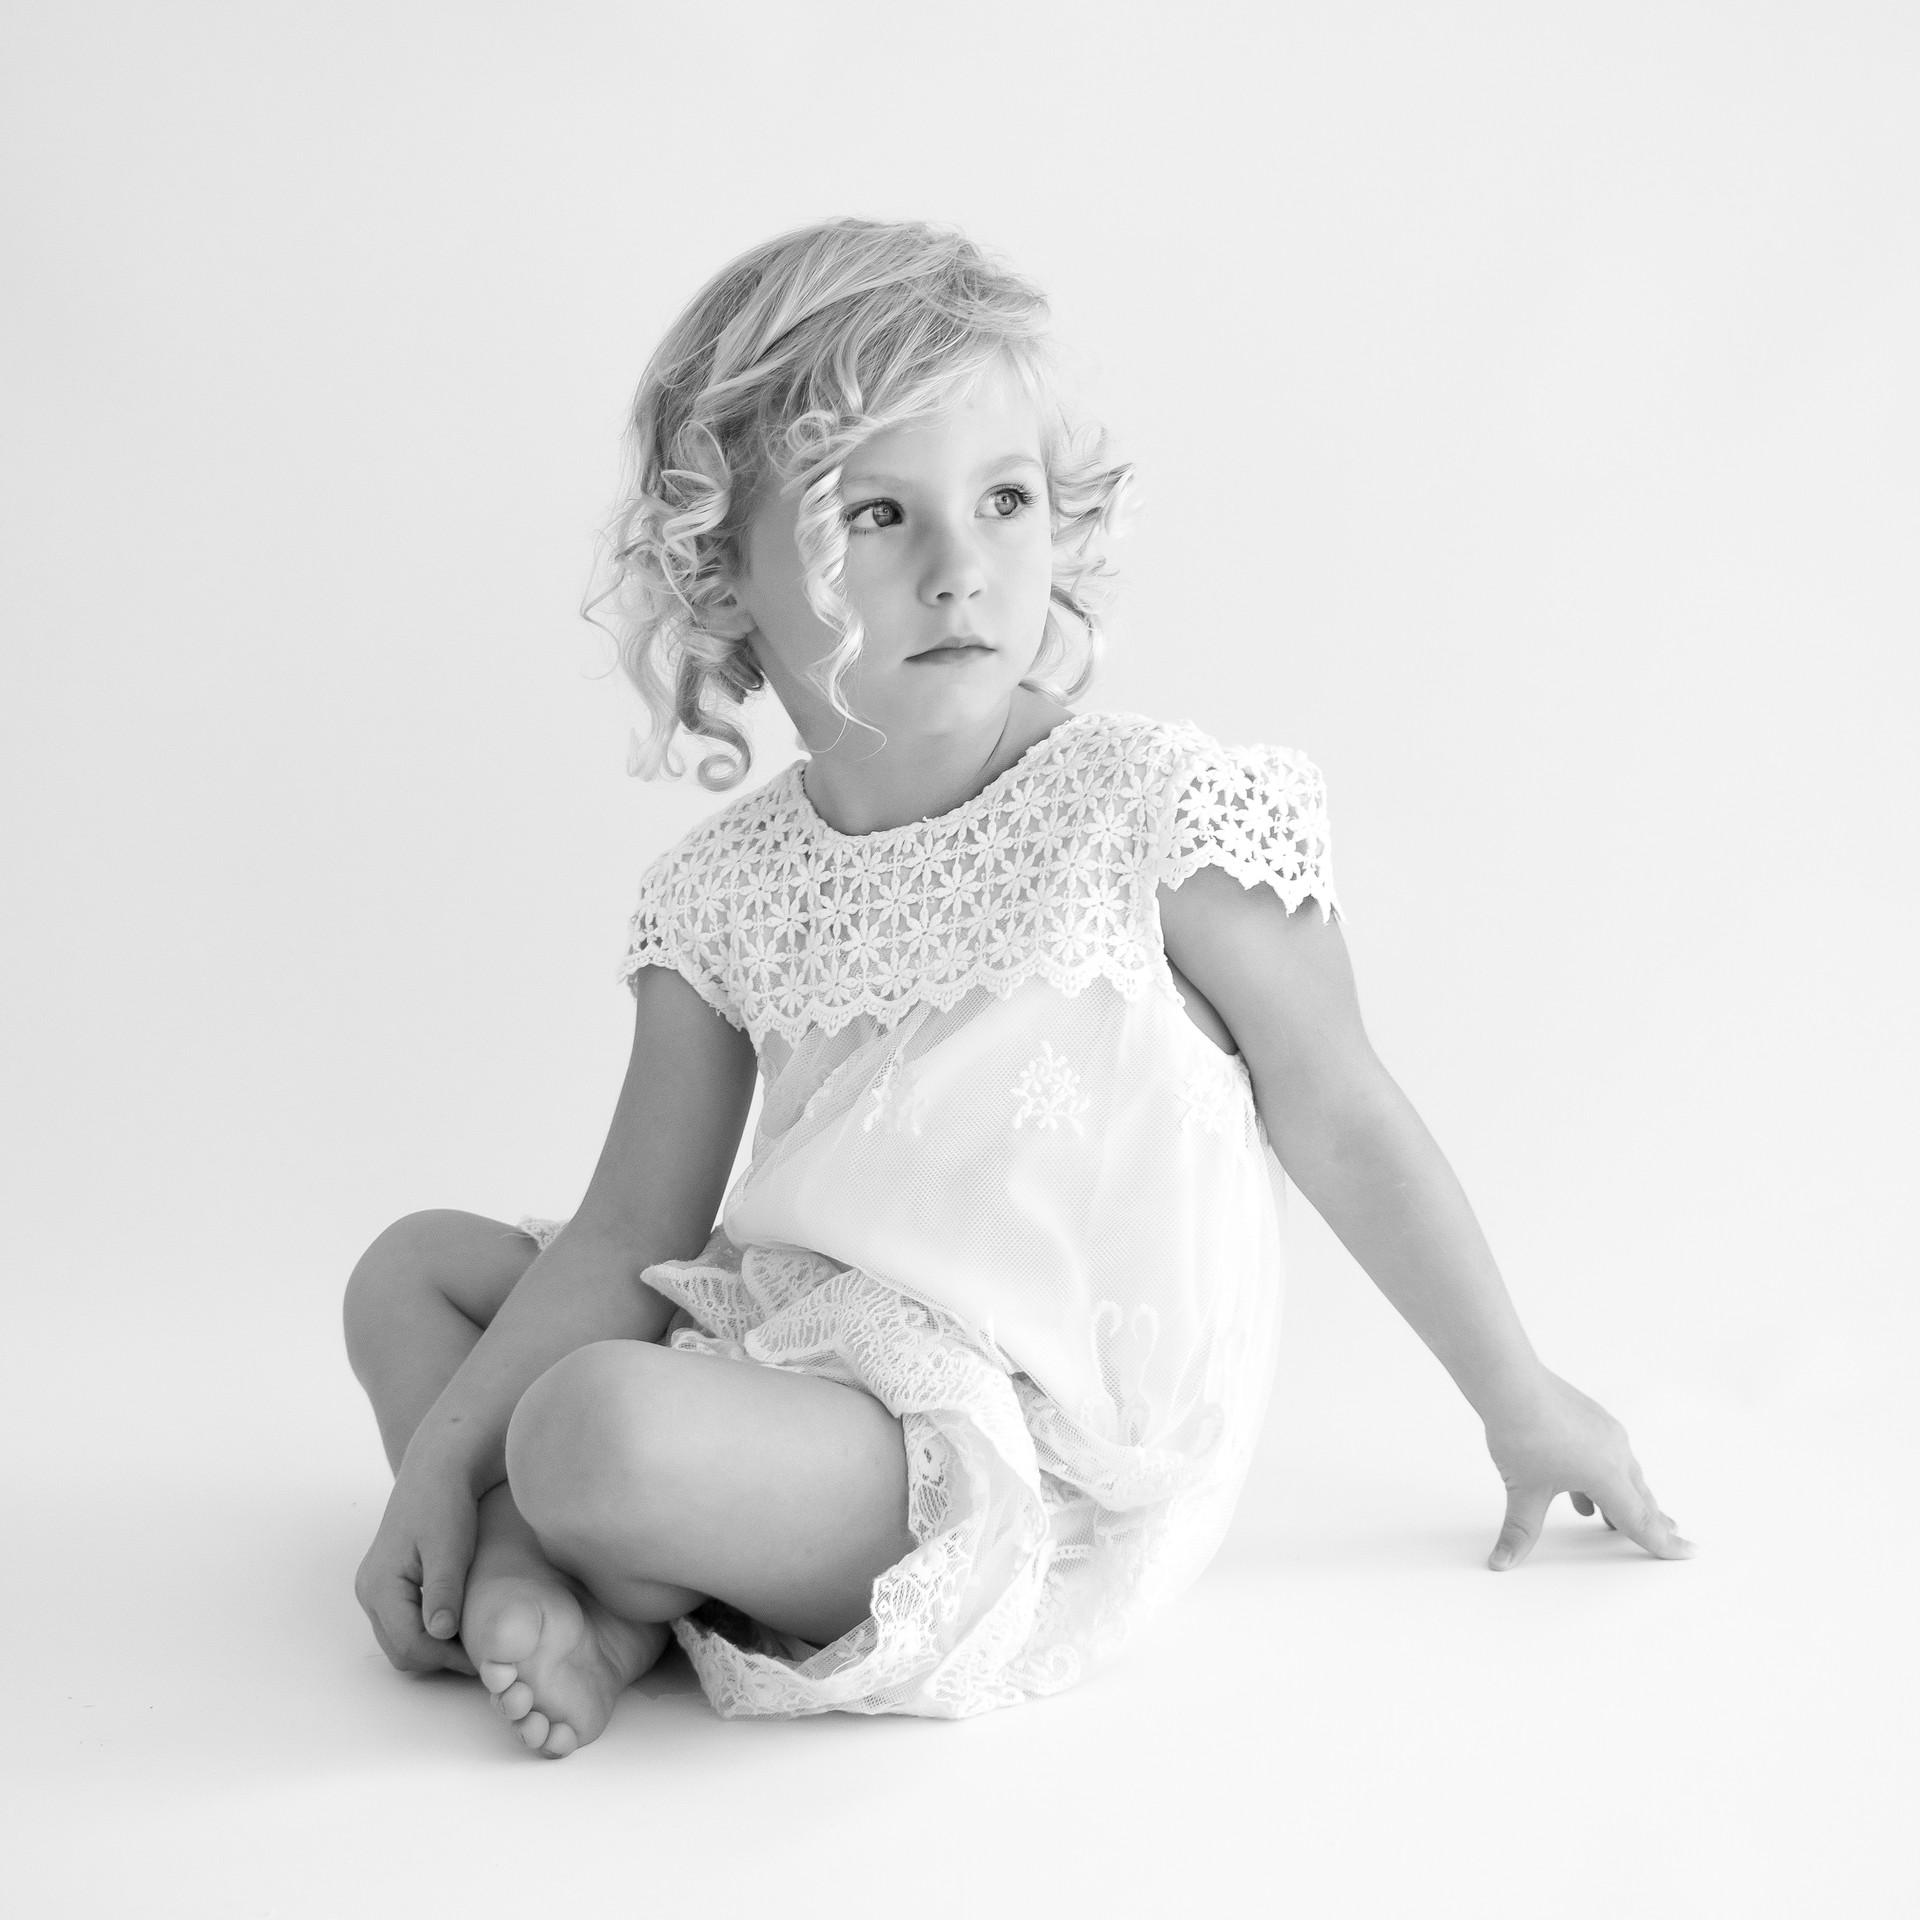 Myah. Creative Children's Photography Studio shoot, Dream Alice Photography & Art, Gold Coast